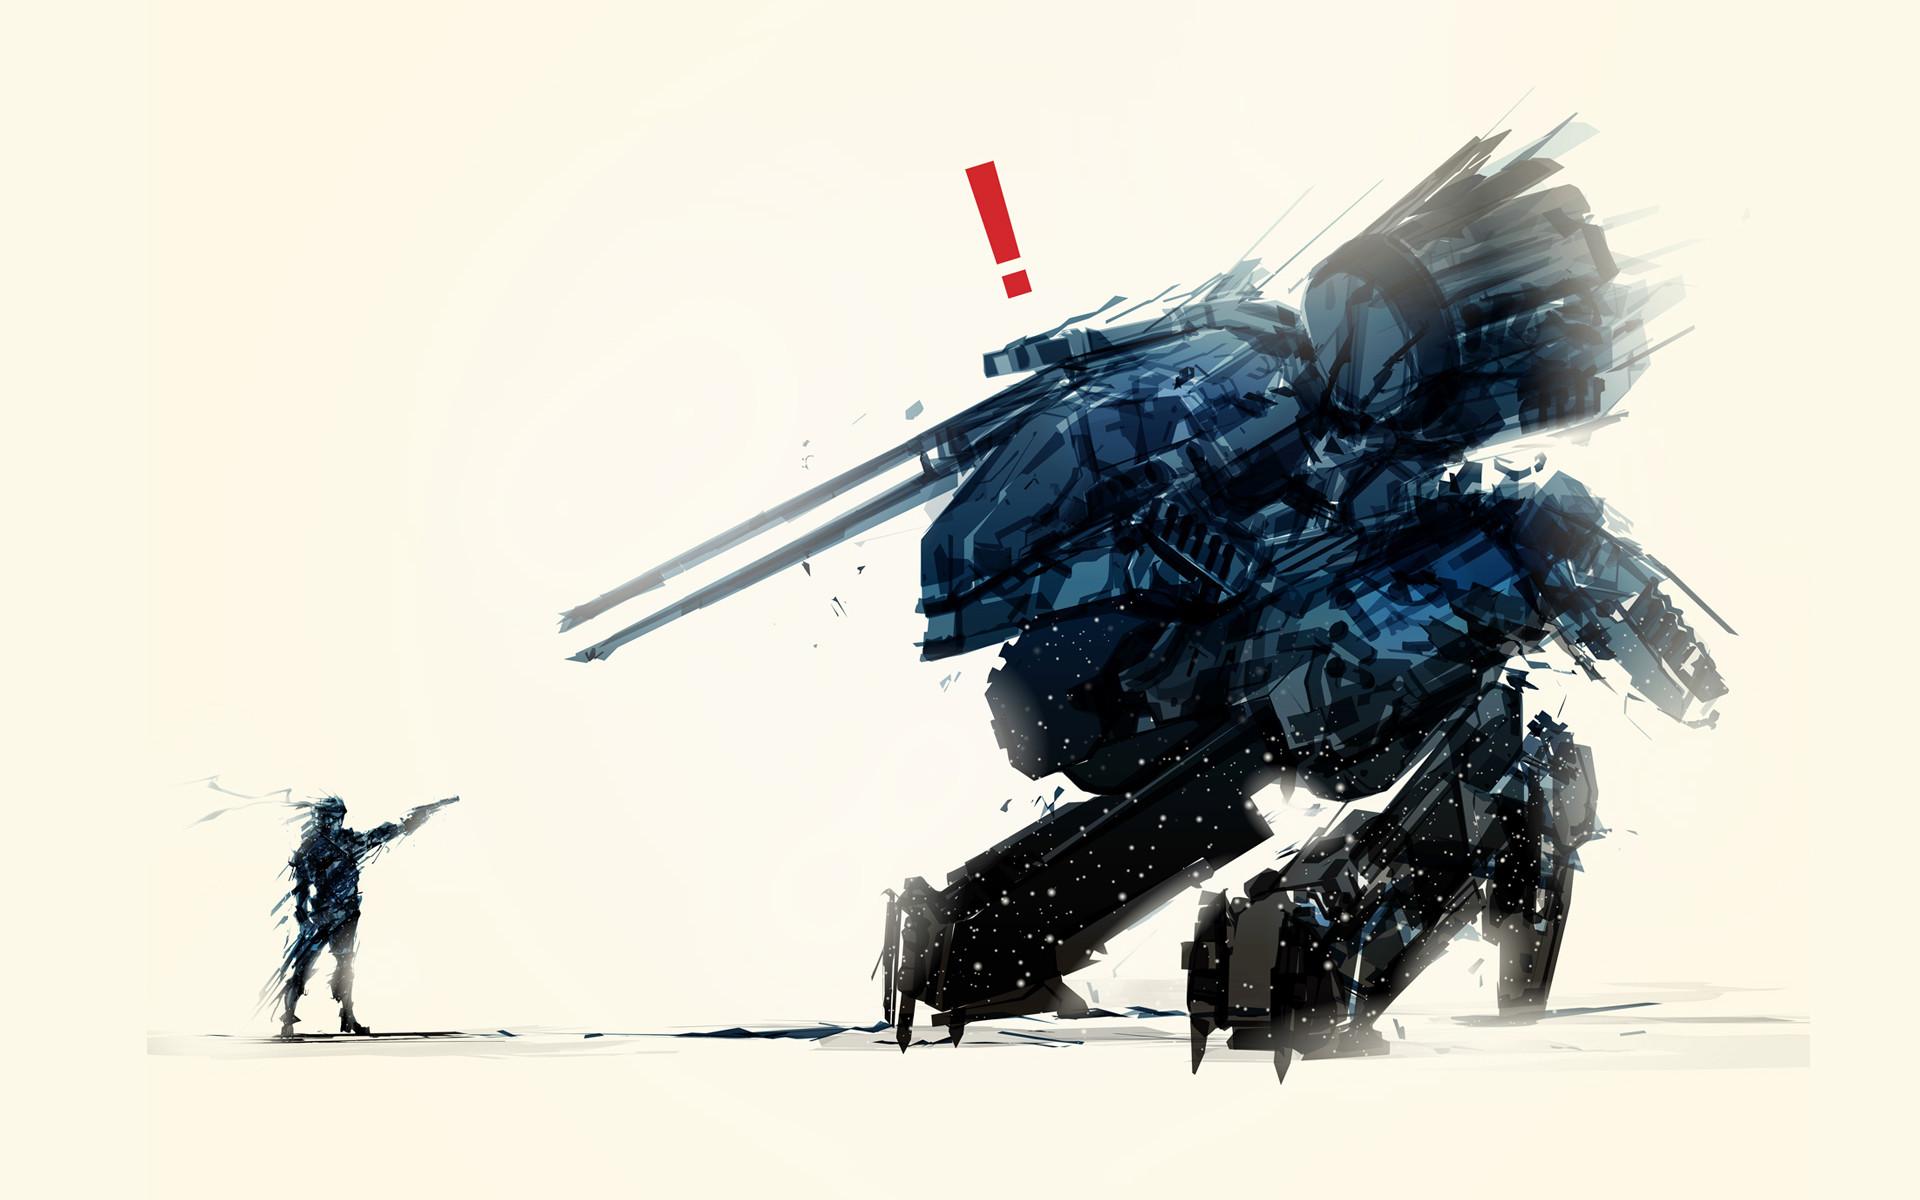 metal-gear-solid-rex-art